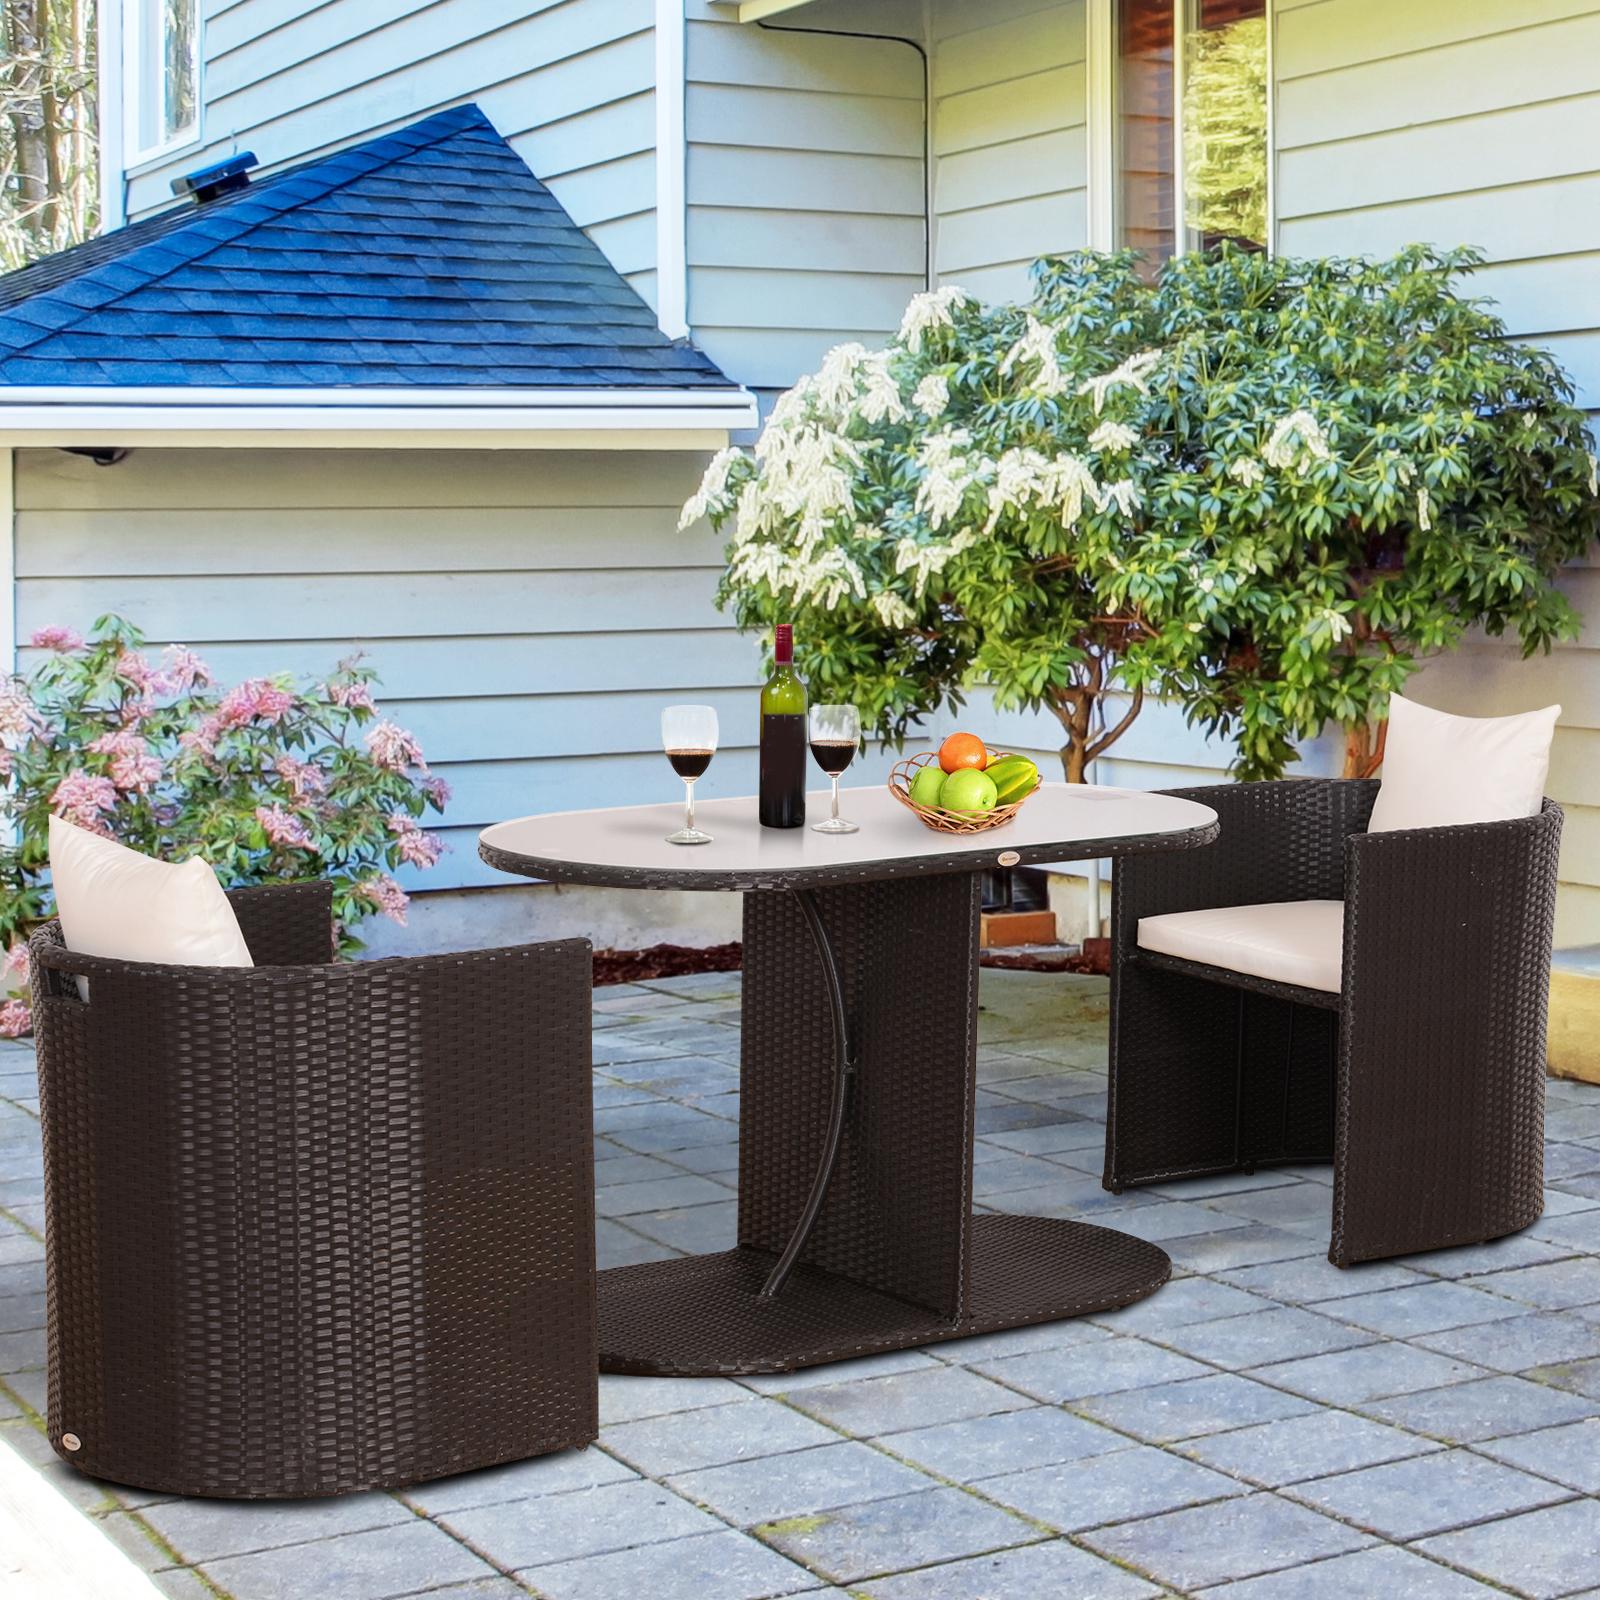 Details Zu Outsunny Gartenmobel 7 Tlg Polyrattan Gartenset Balkonmobel Sitzgruppe Garnitur